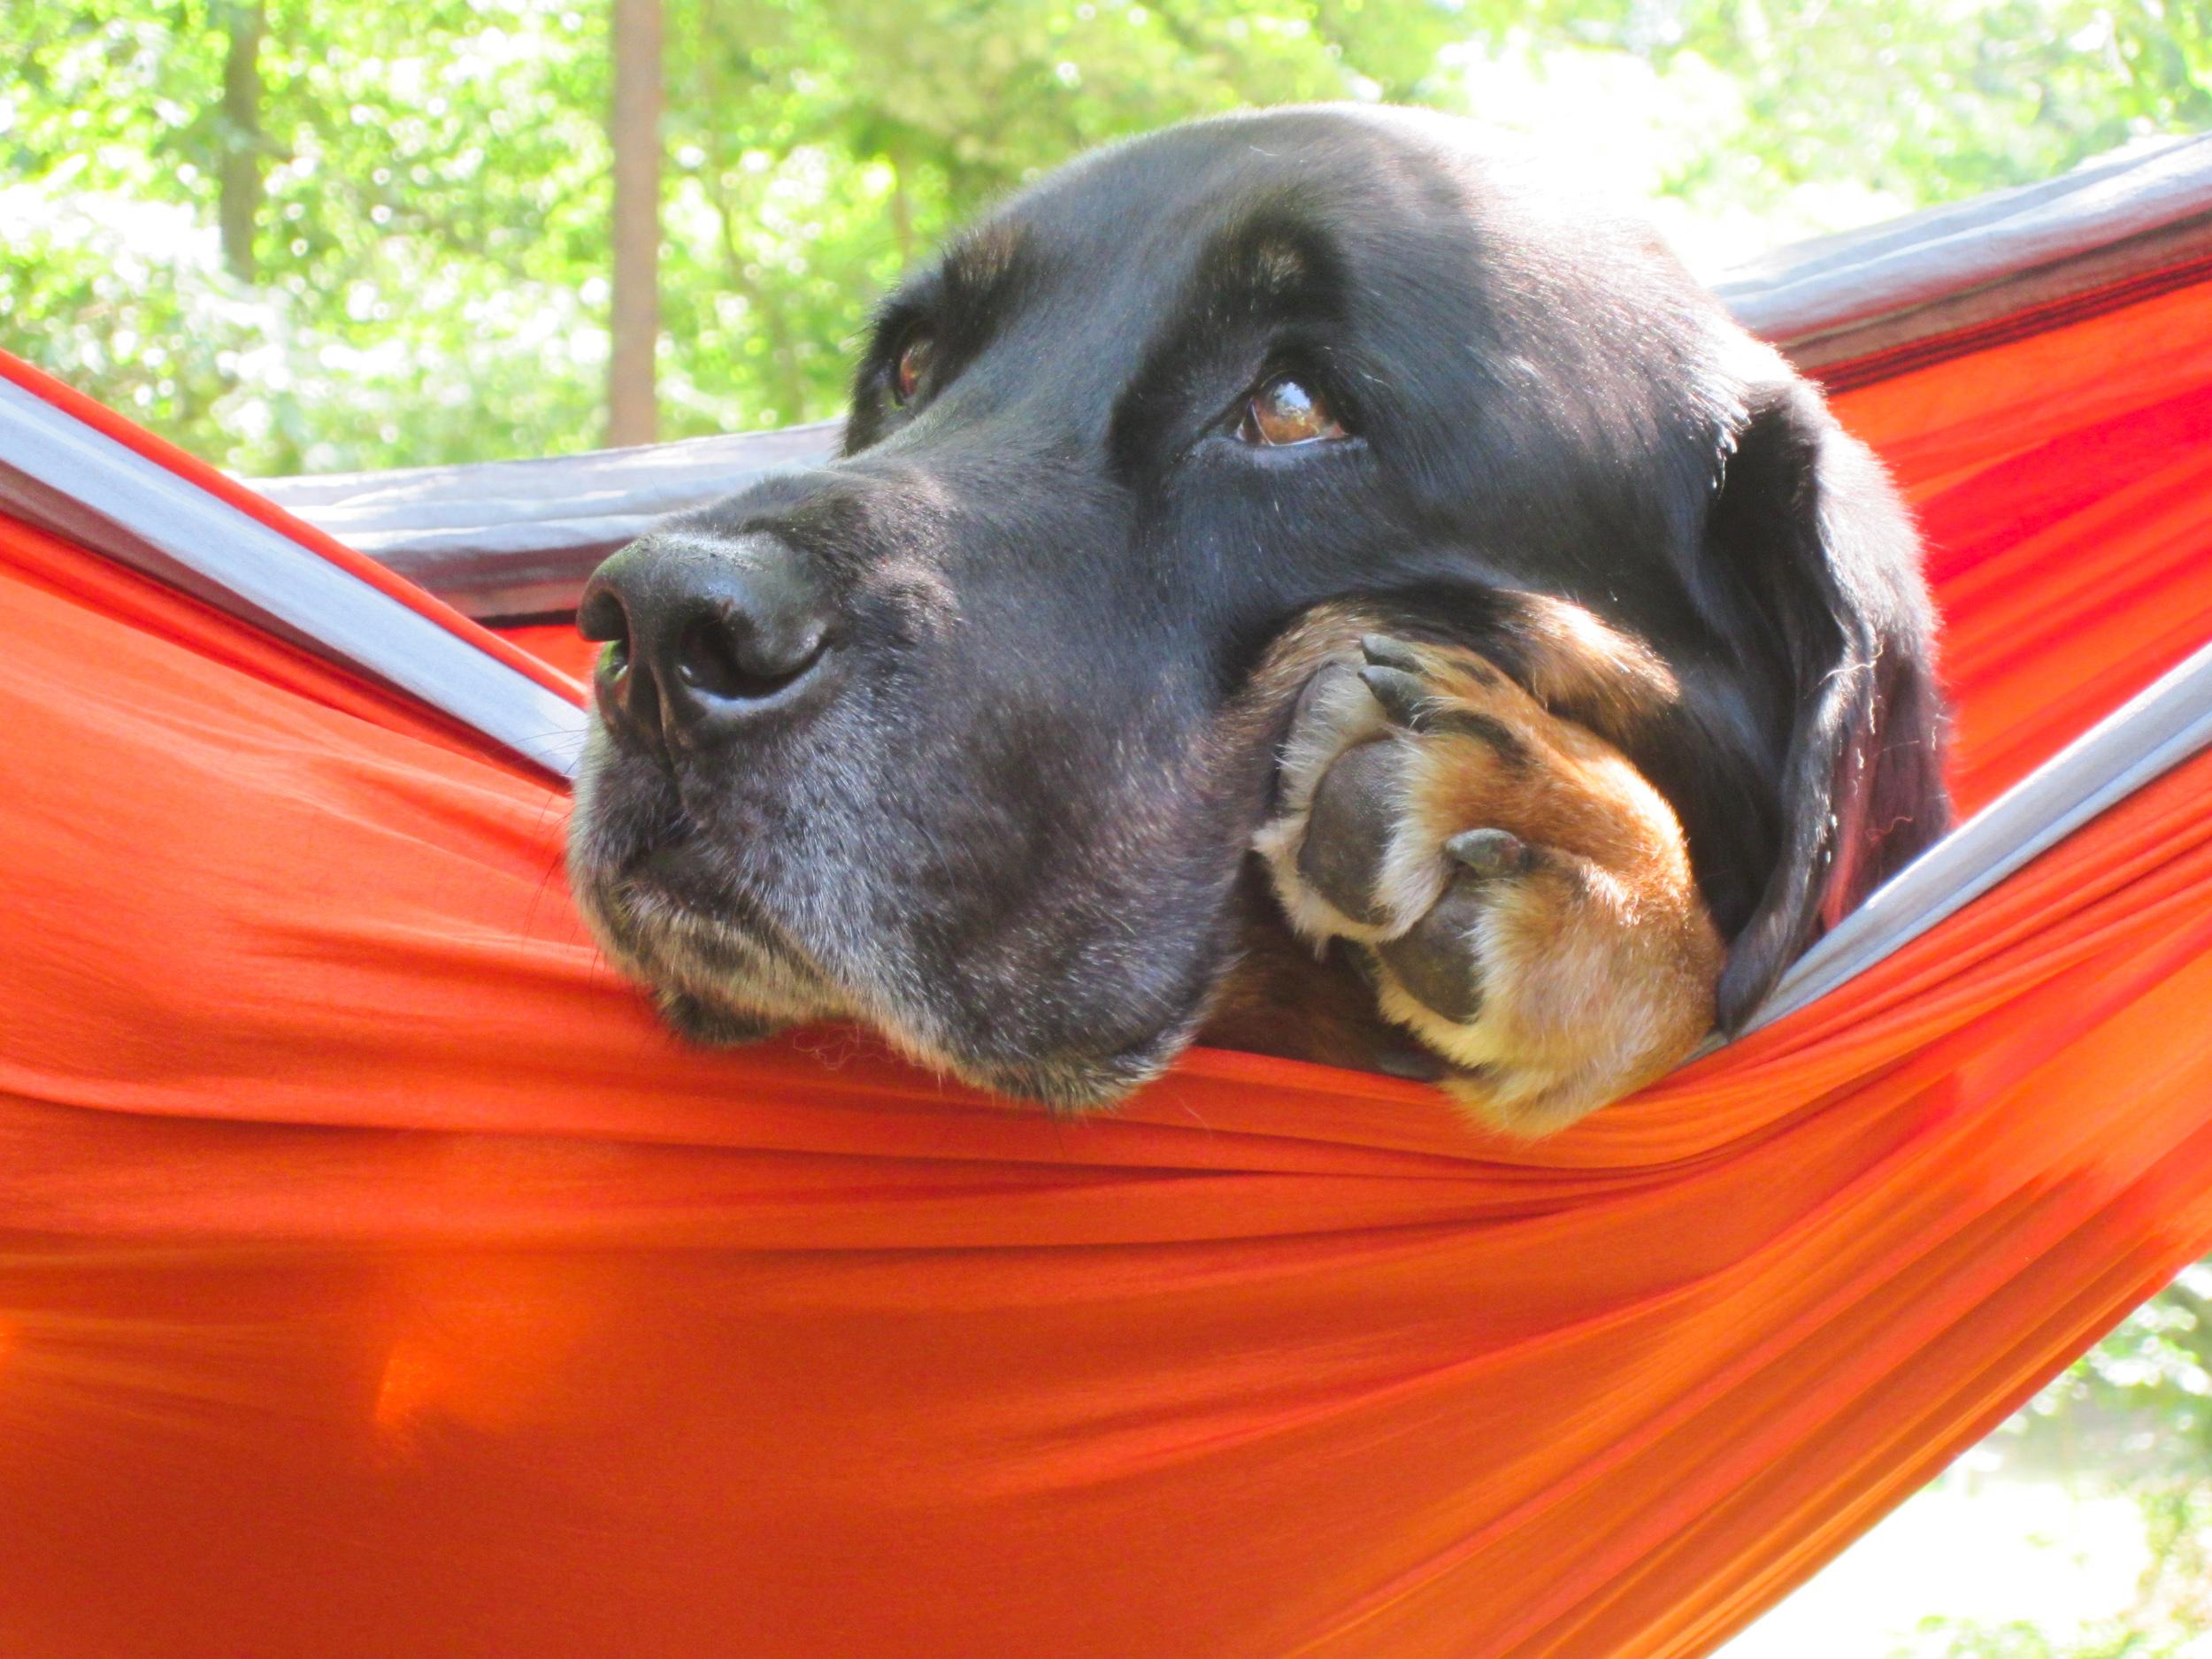 Tybee lounging in an ENO hammock.